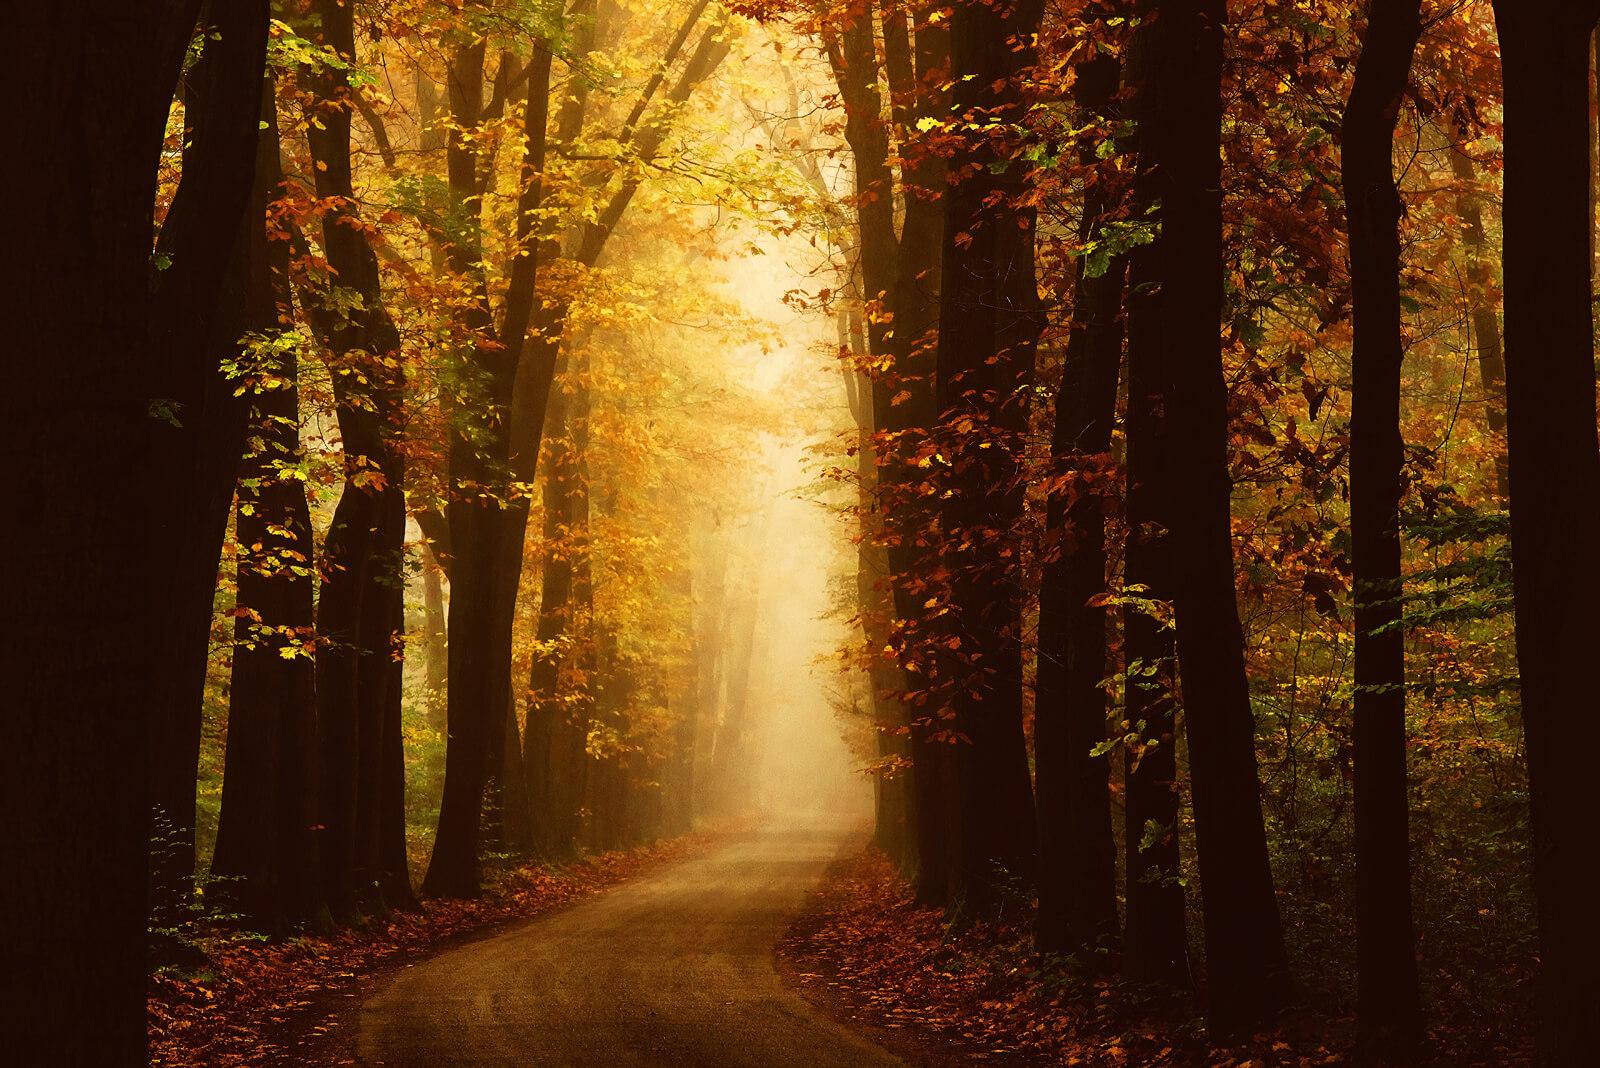 Fall in Velhorst